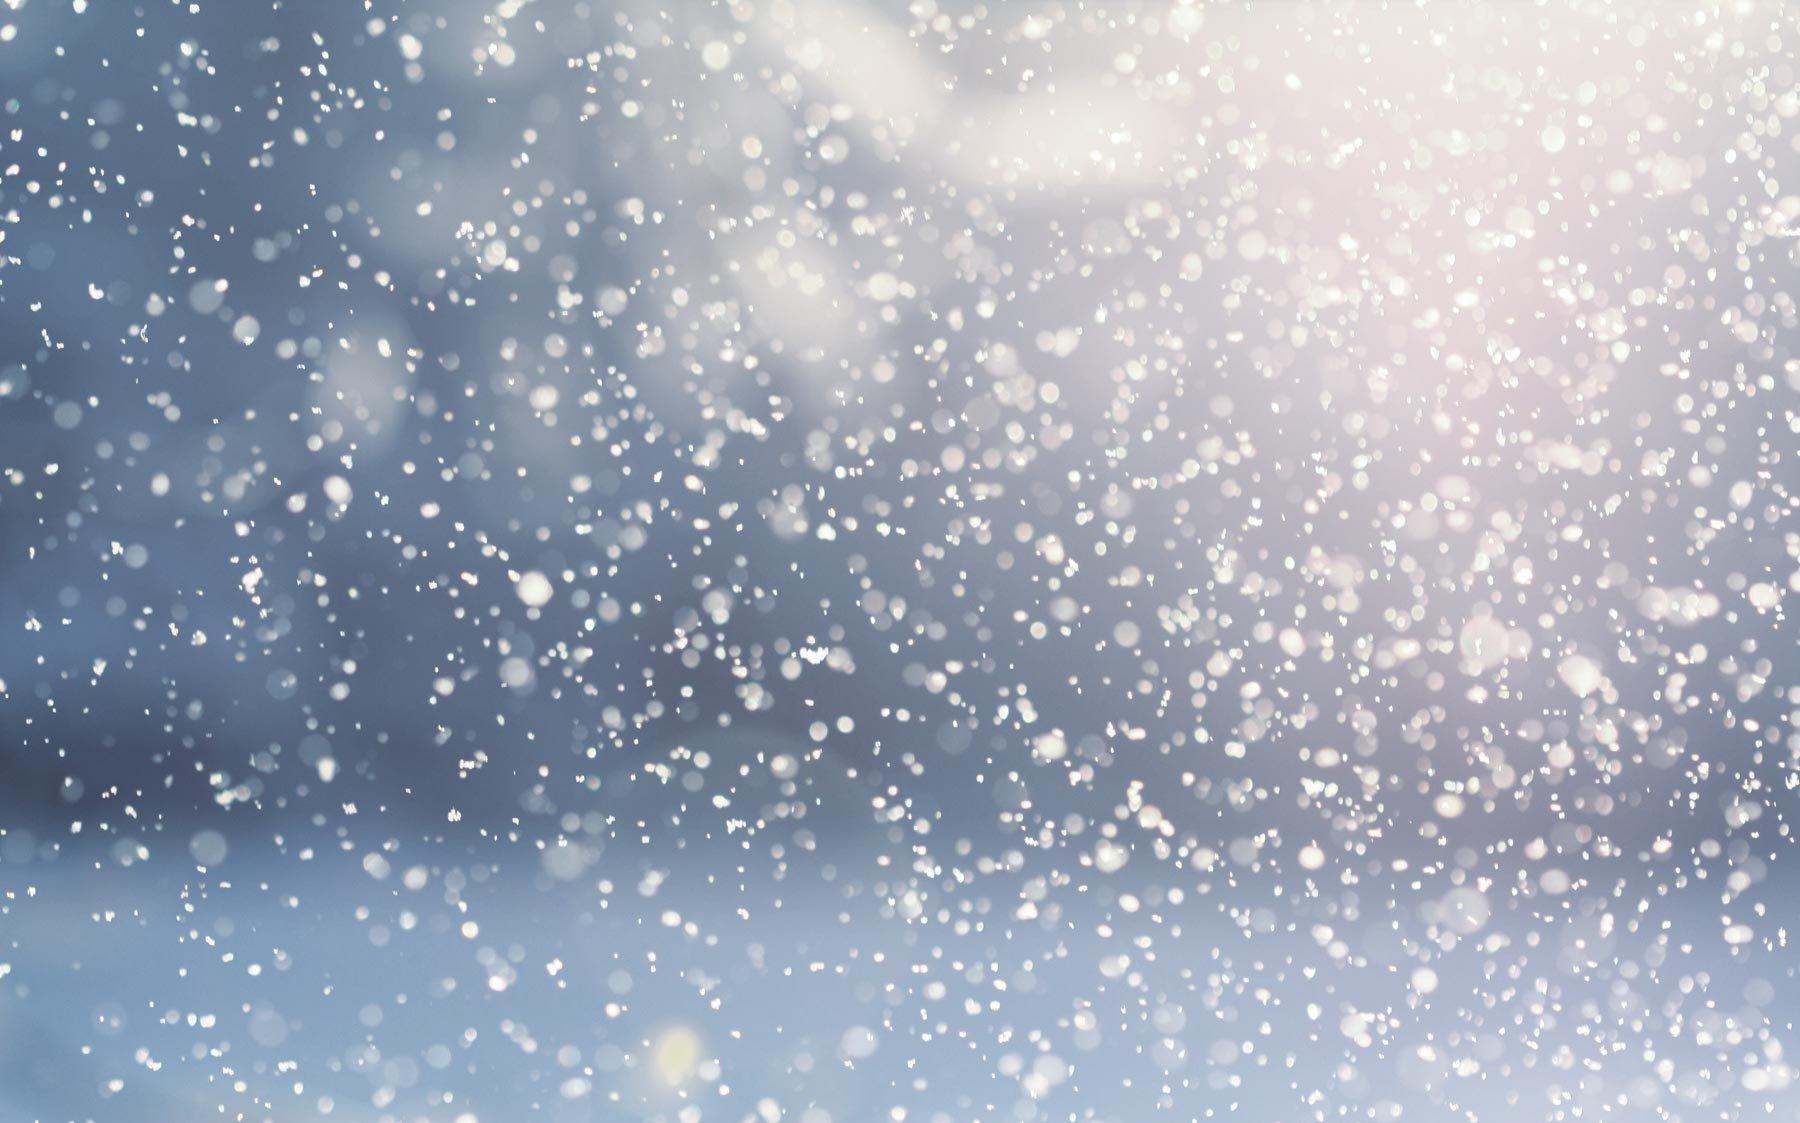 Восемь человек погибло на востоке США из-за снегопада